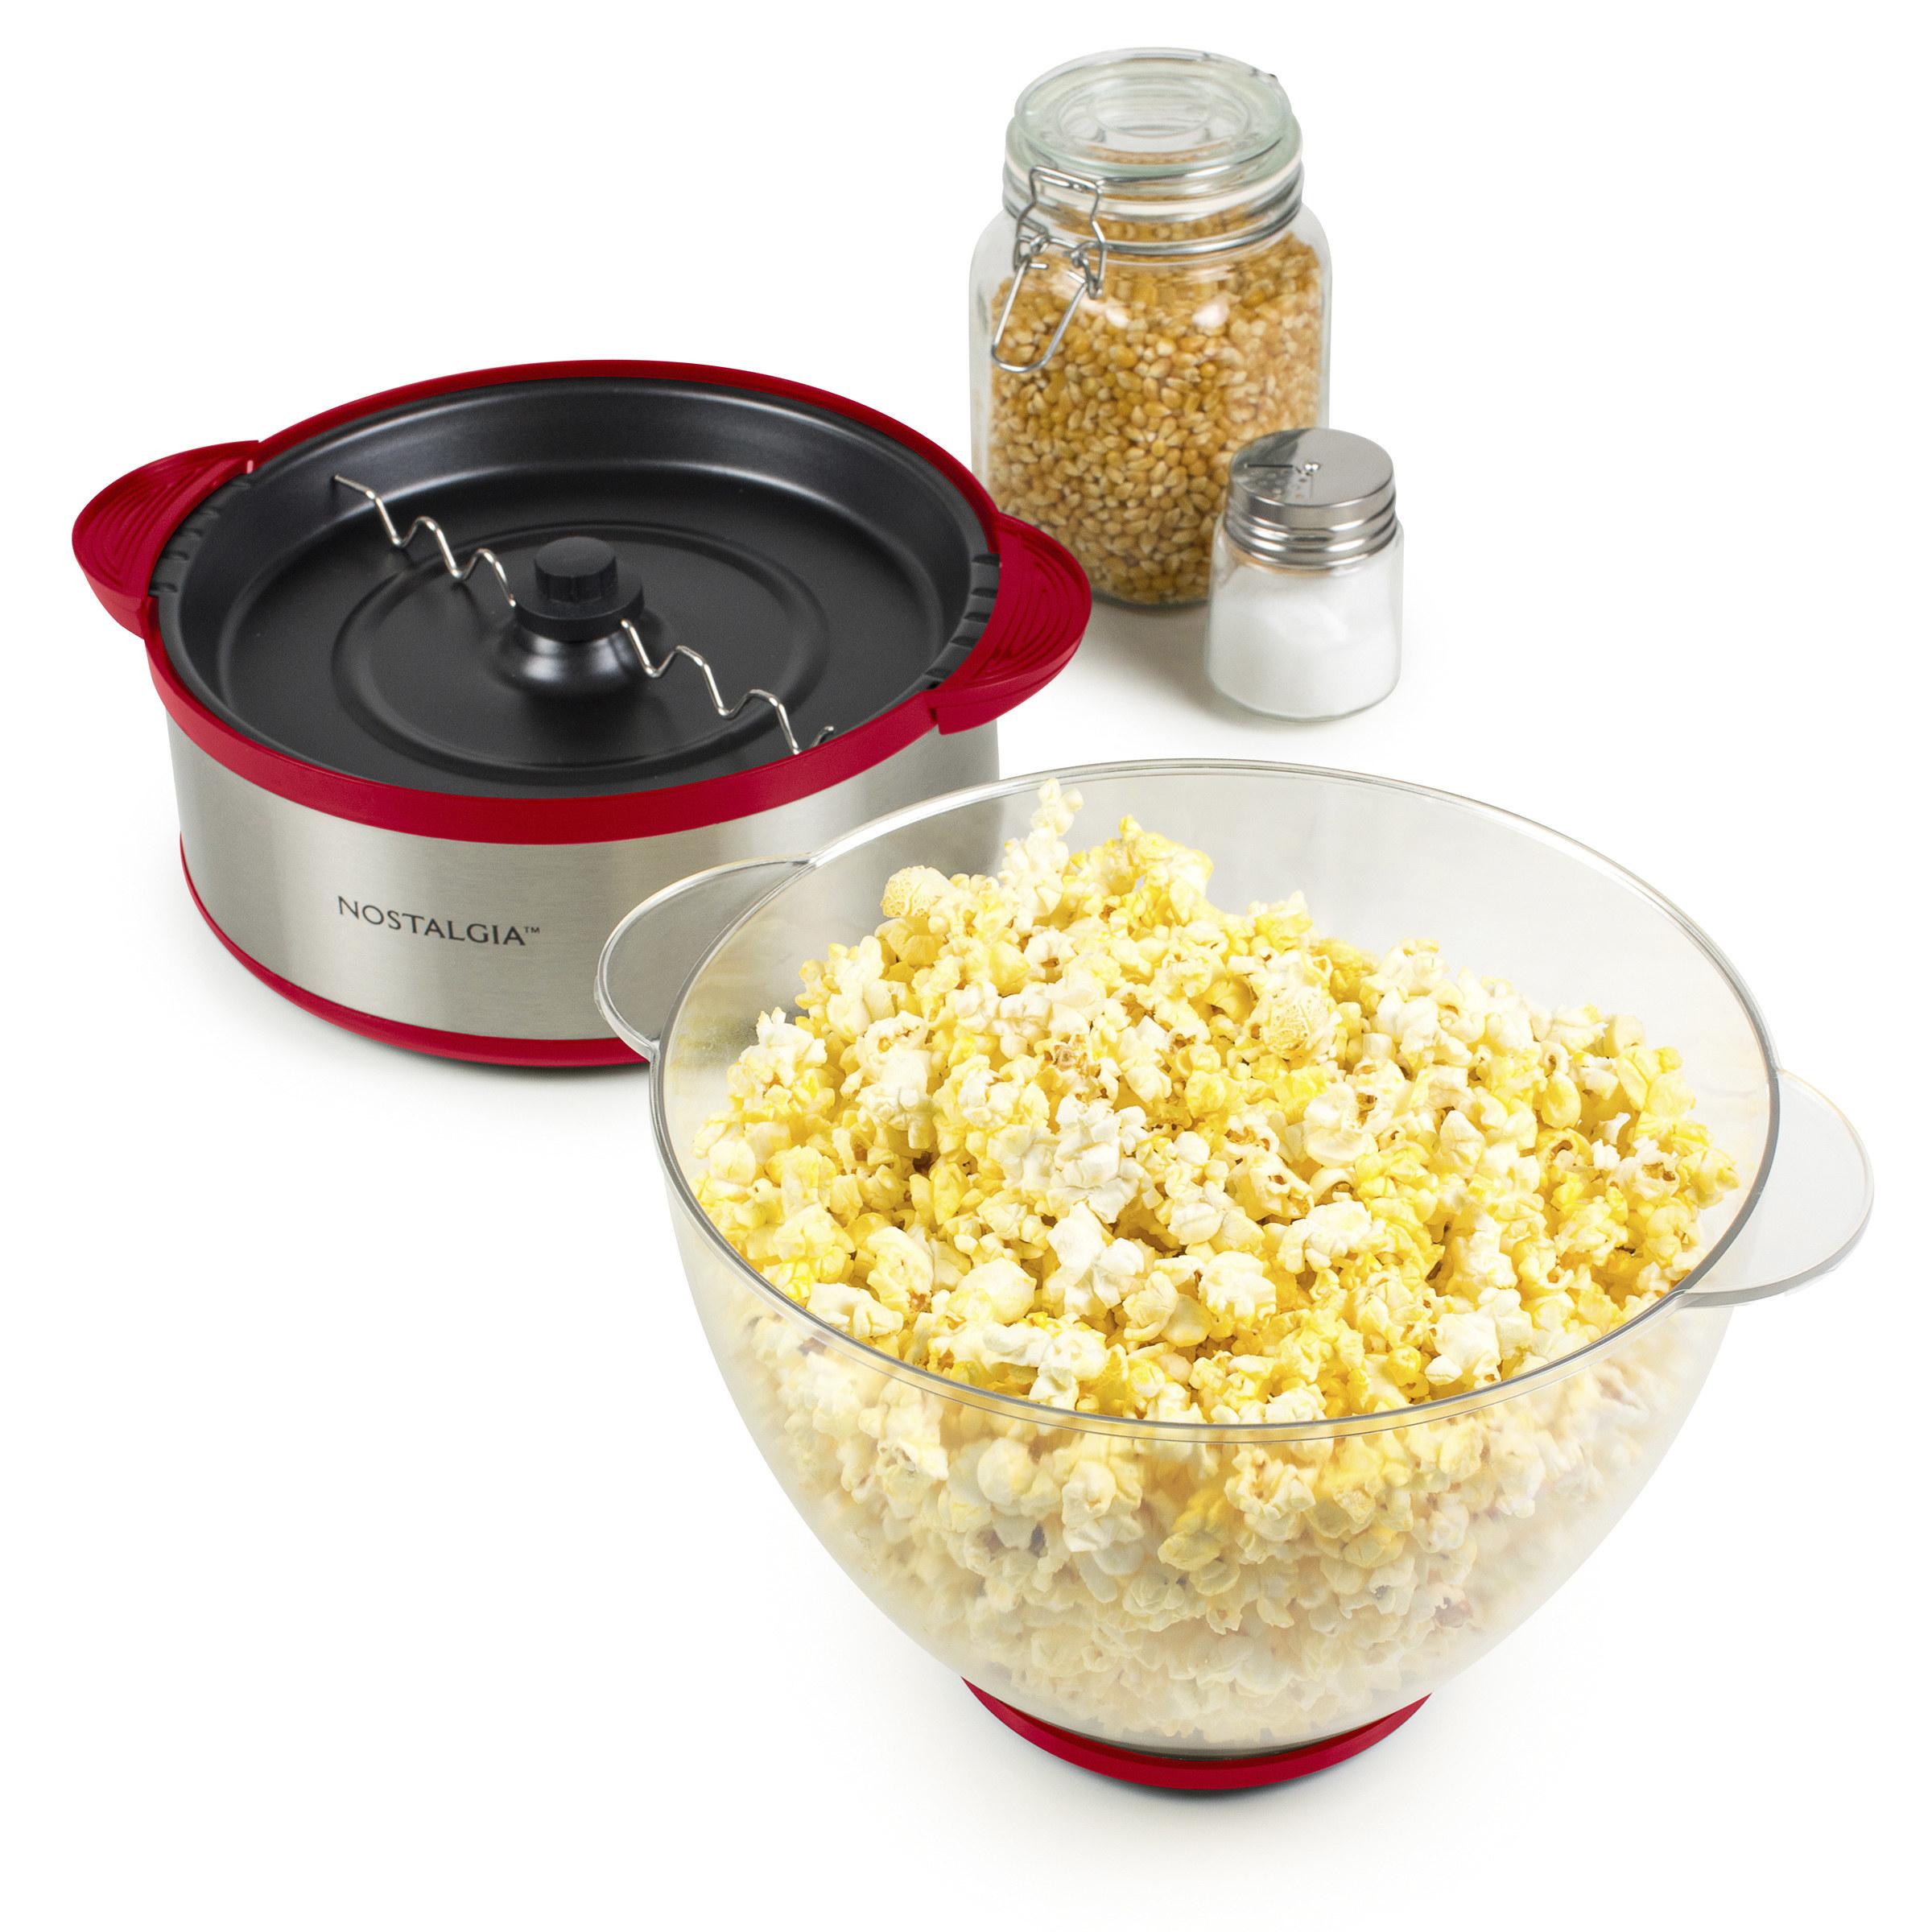 The popcorn popper